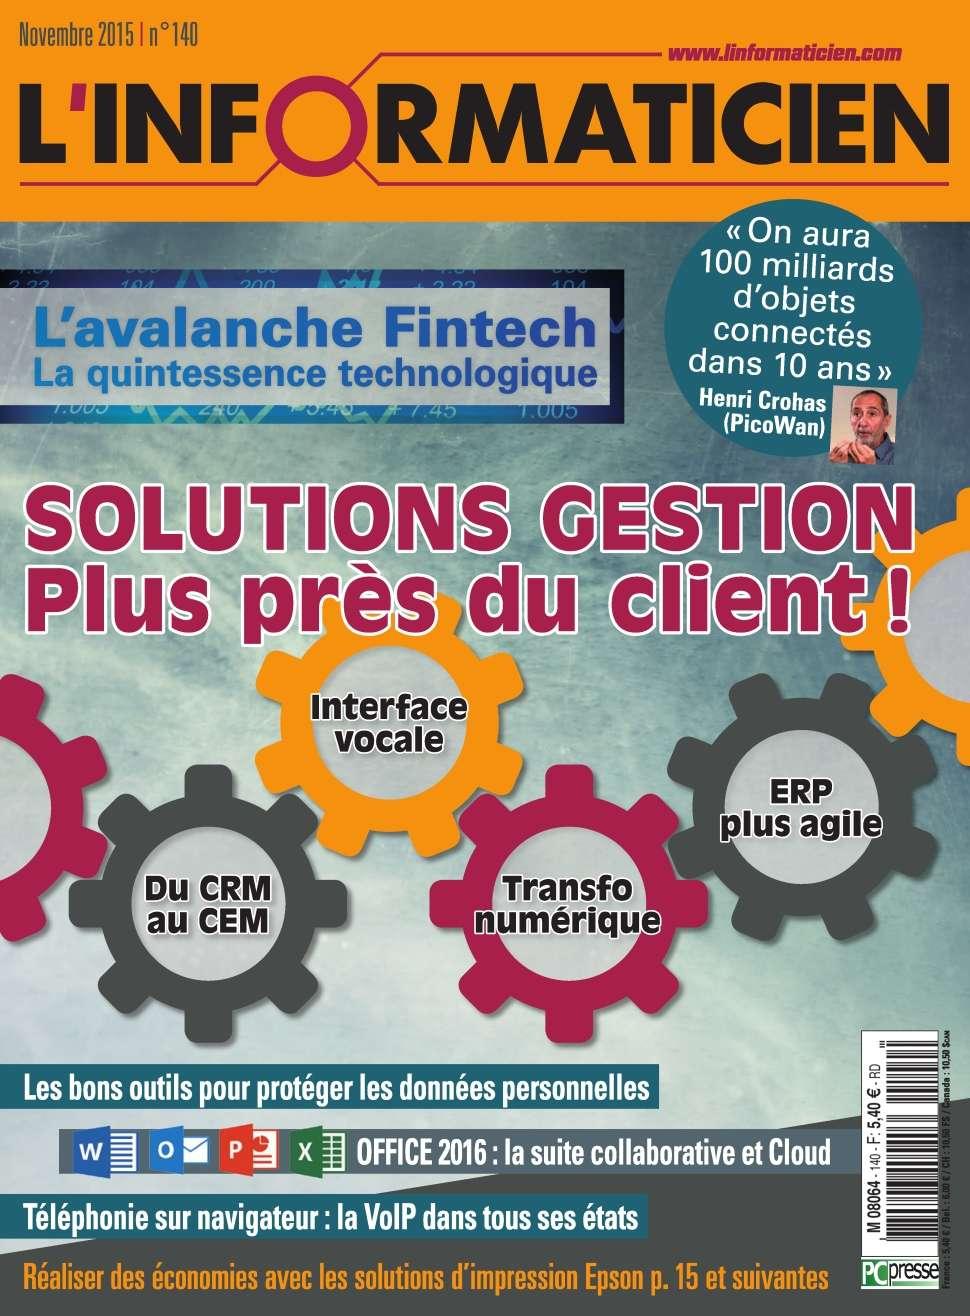 L'Informaticien 140 - November 2015